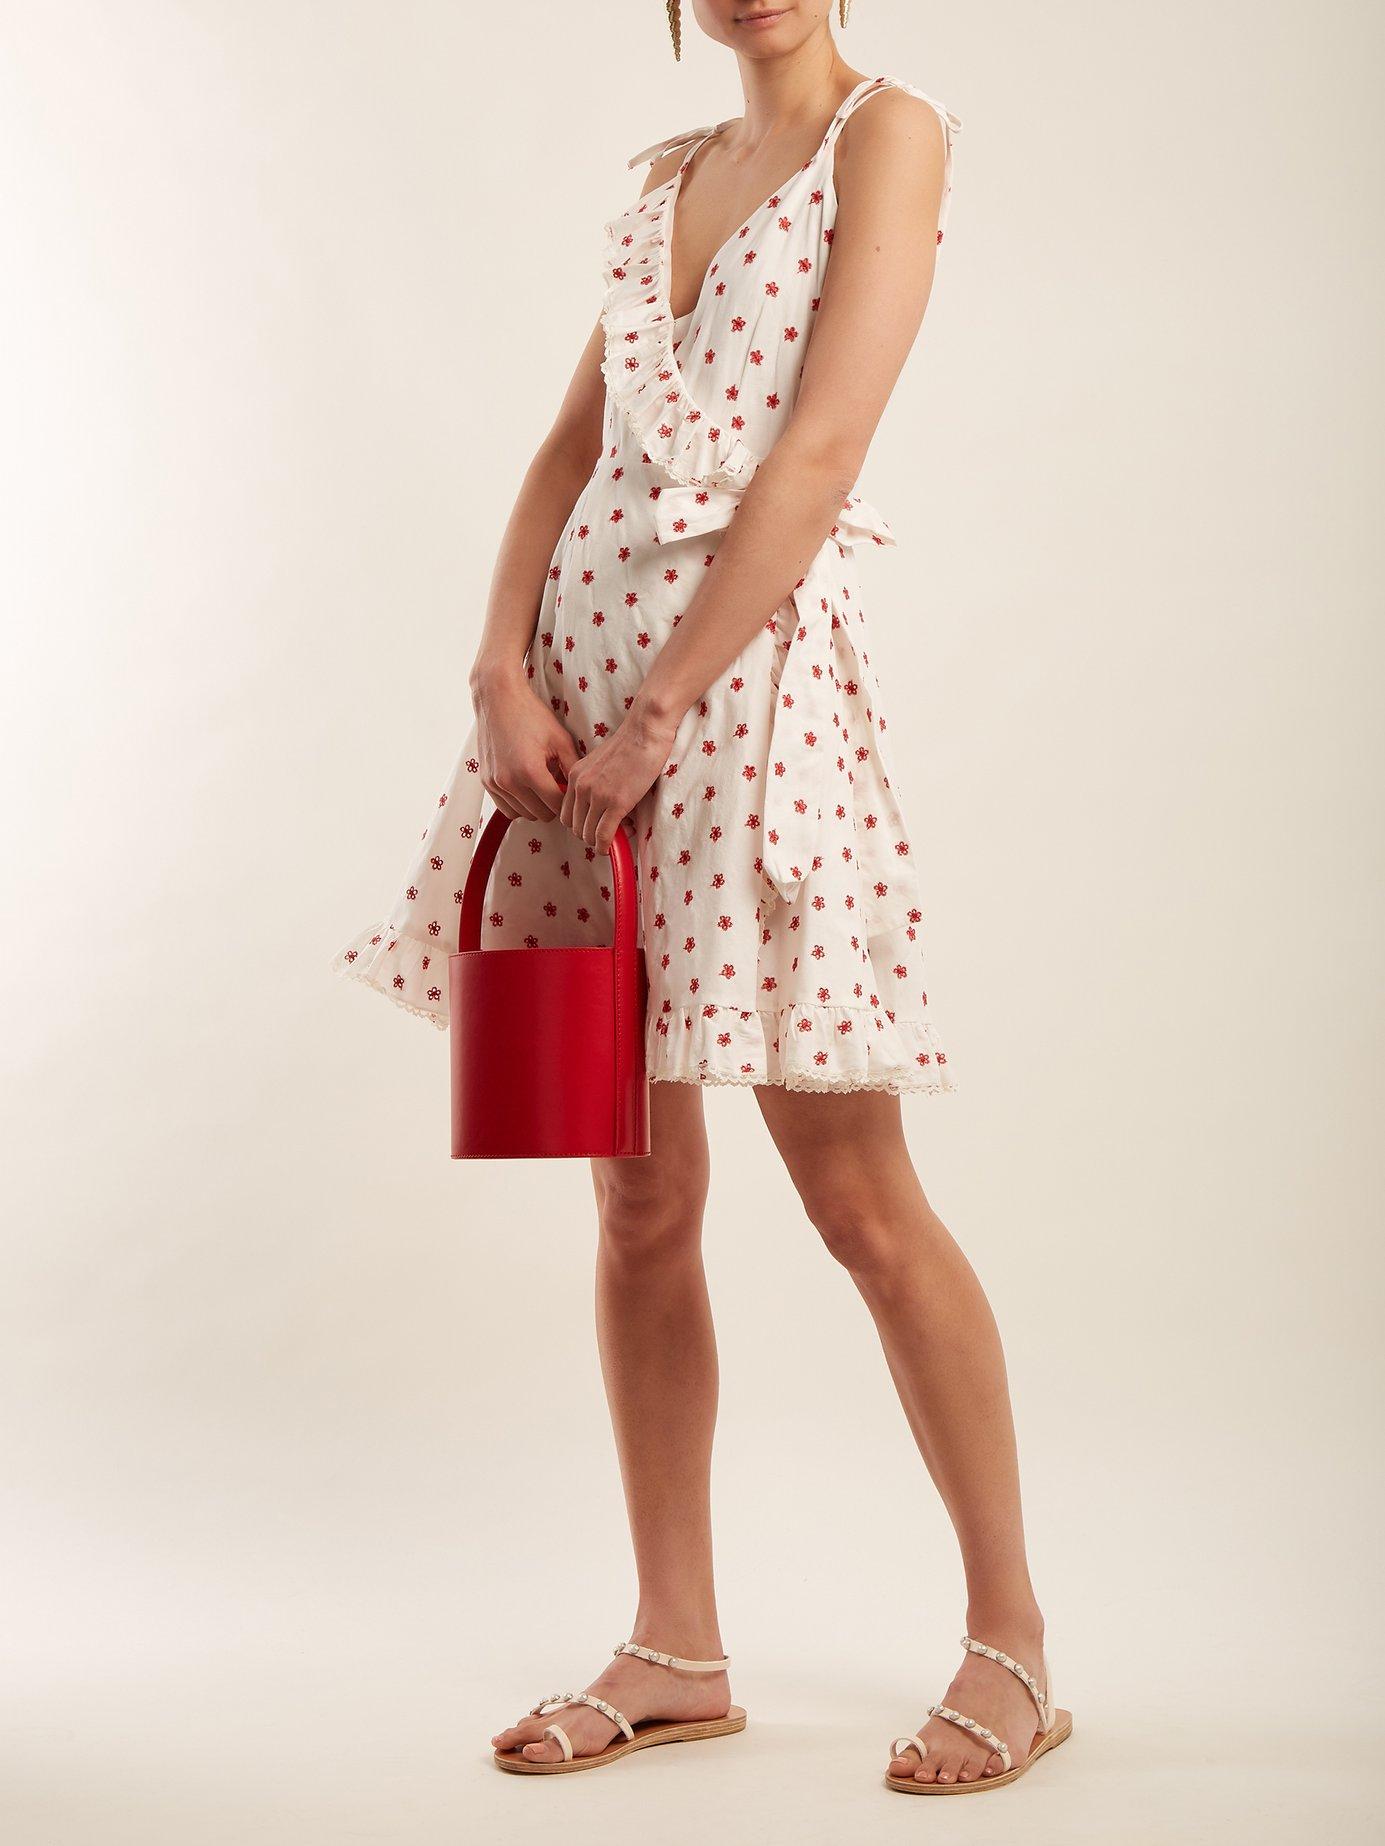 Embroidered cotton-blend wrap dress by Athena Procopiou